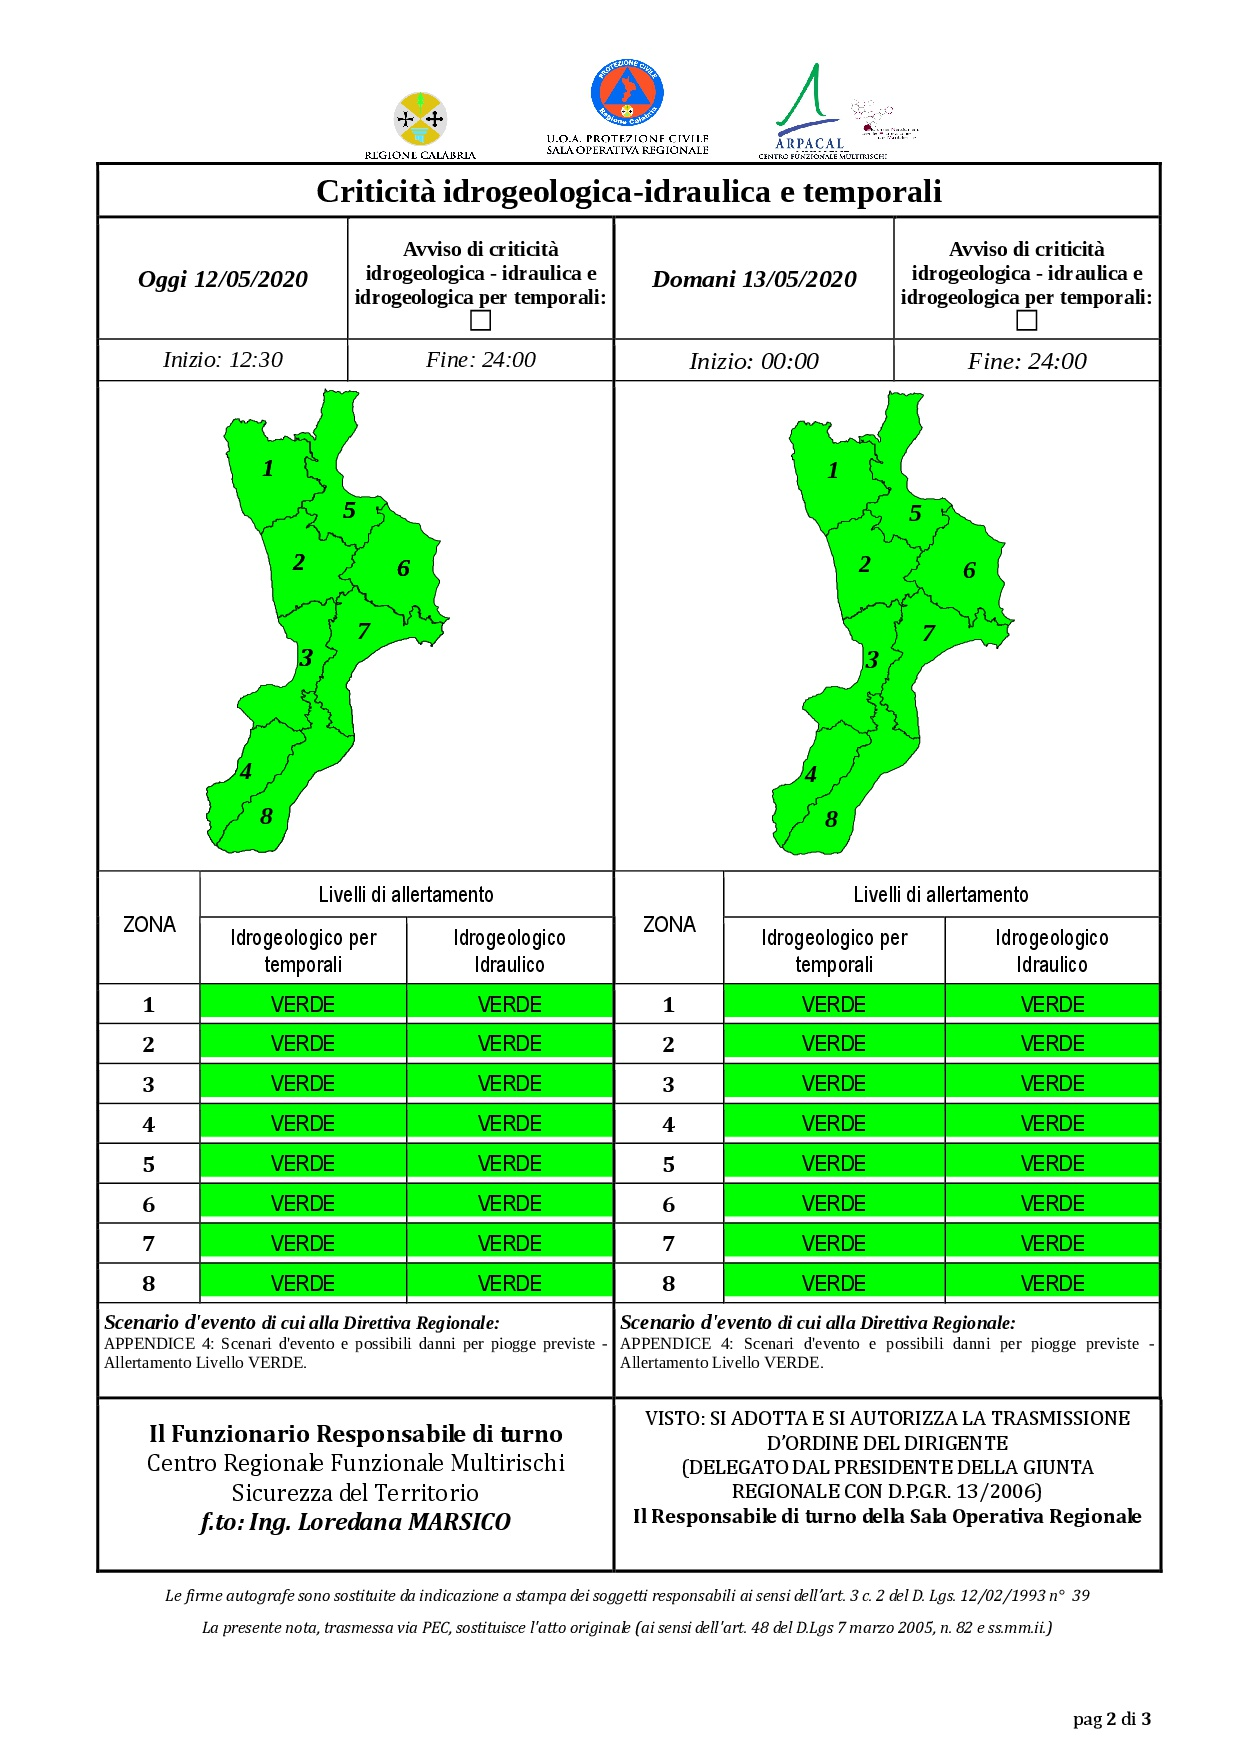 Criticità idrogeologica-idraulica e temporali in Calabria 12-05-2020